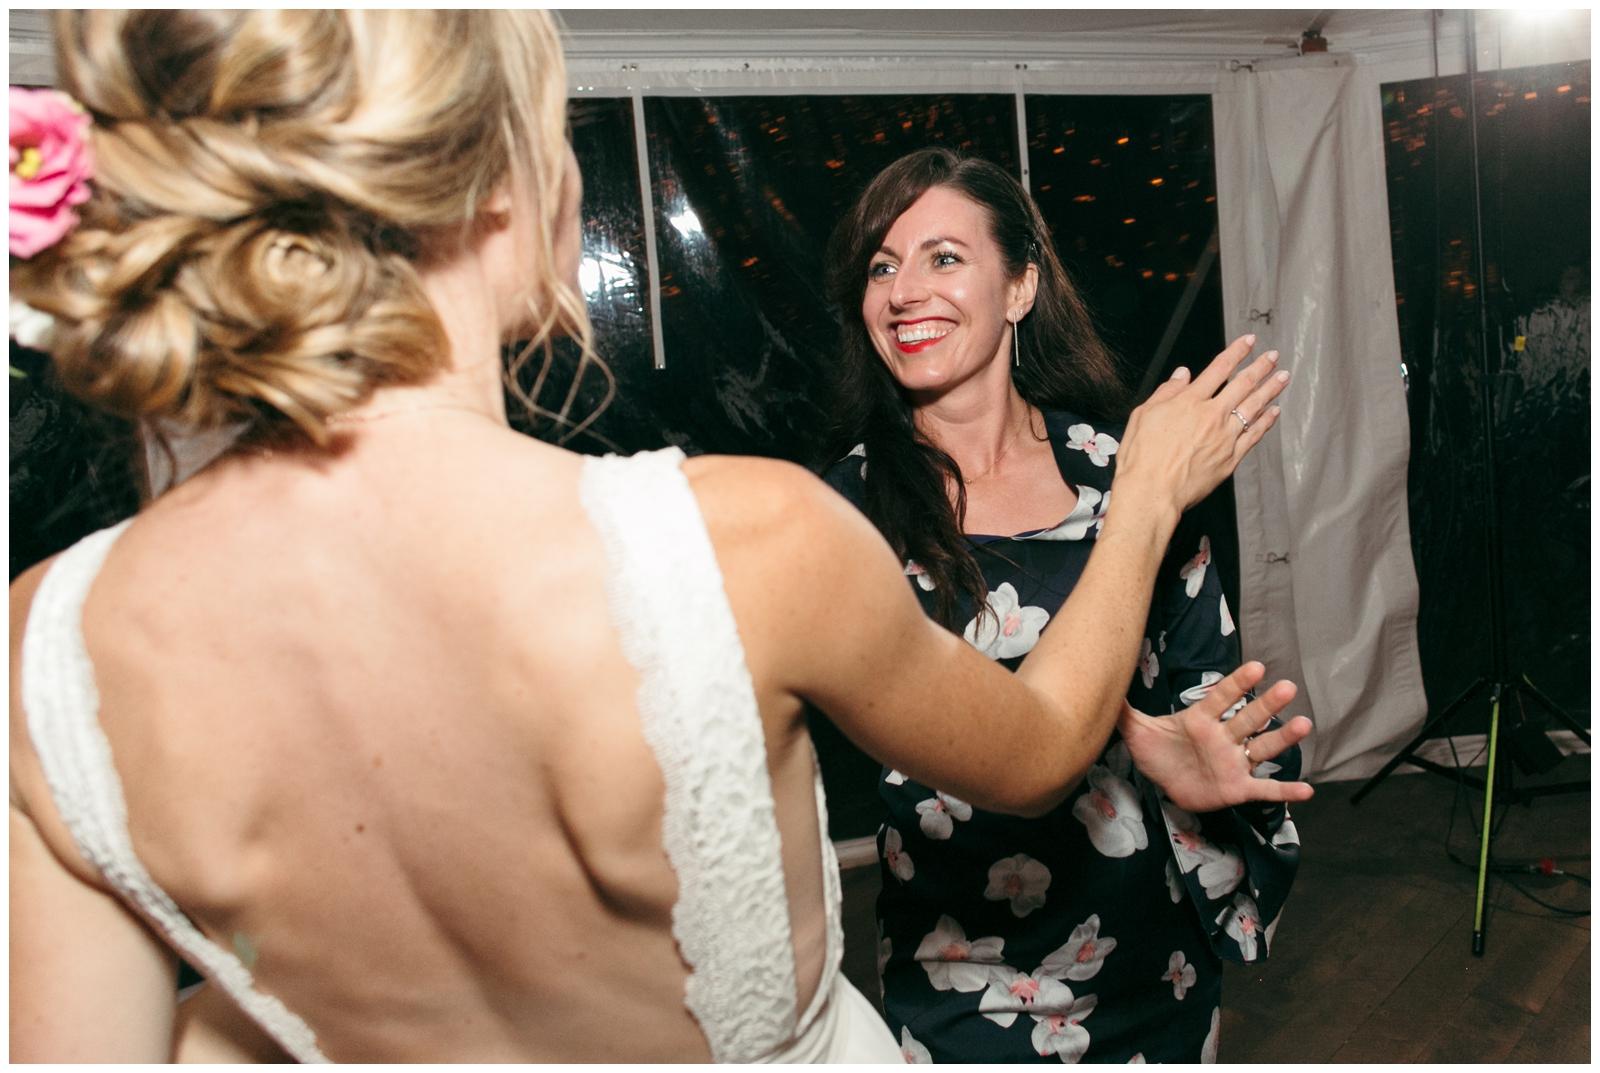 Moraine-Farm-wedding-Bailey-Q-Photo-Massachusetts-wedding-photpgrapher-152.jpg